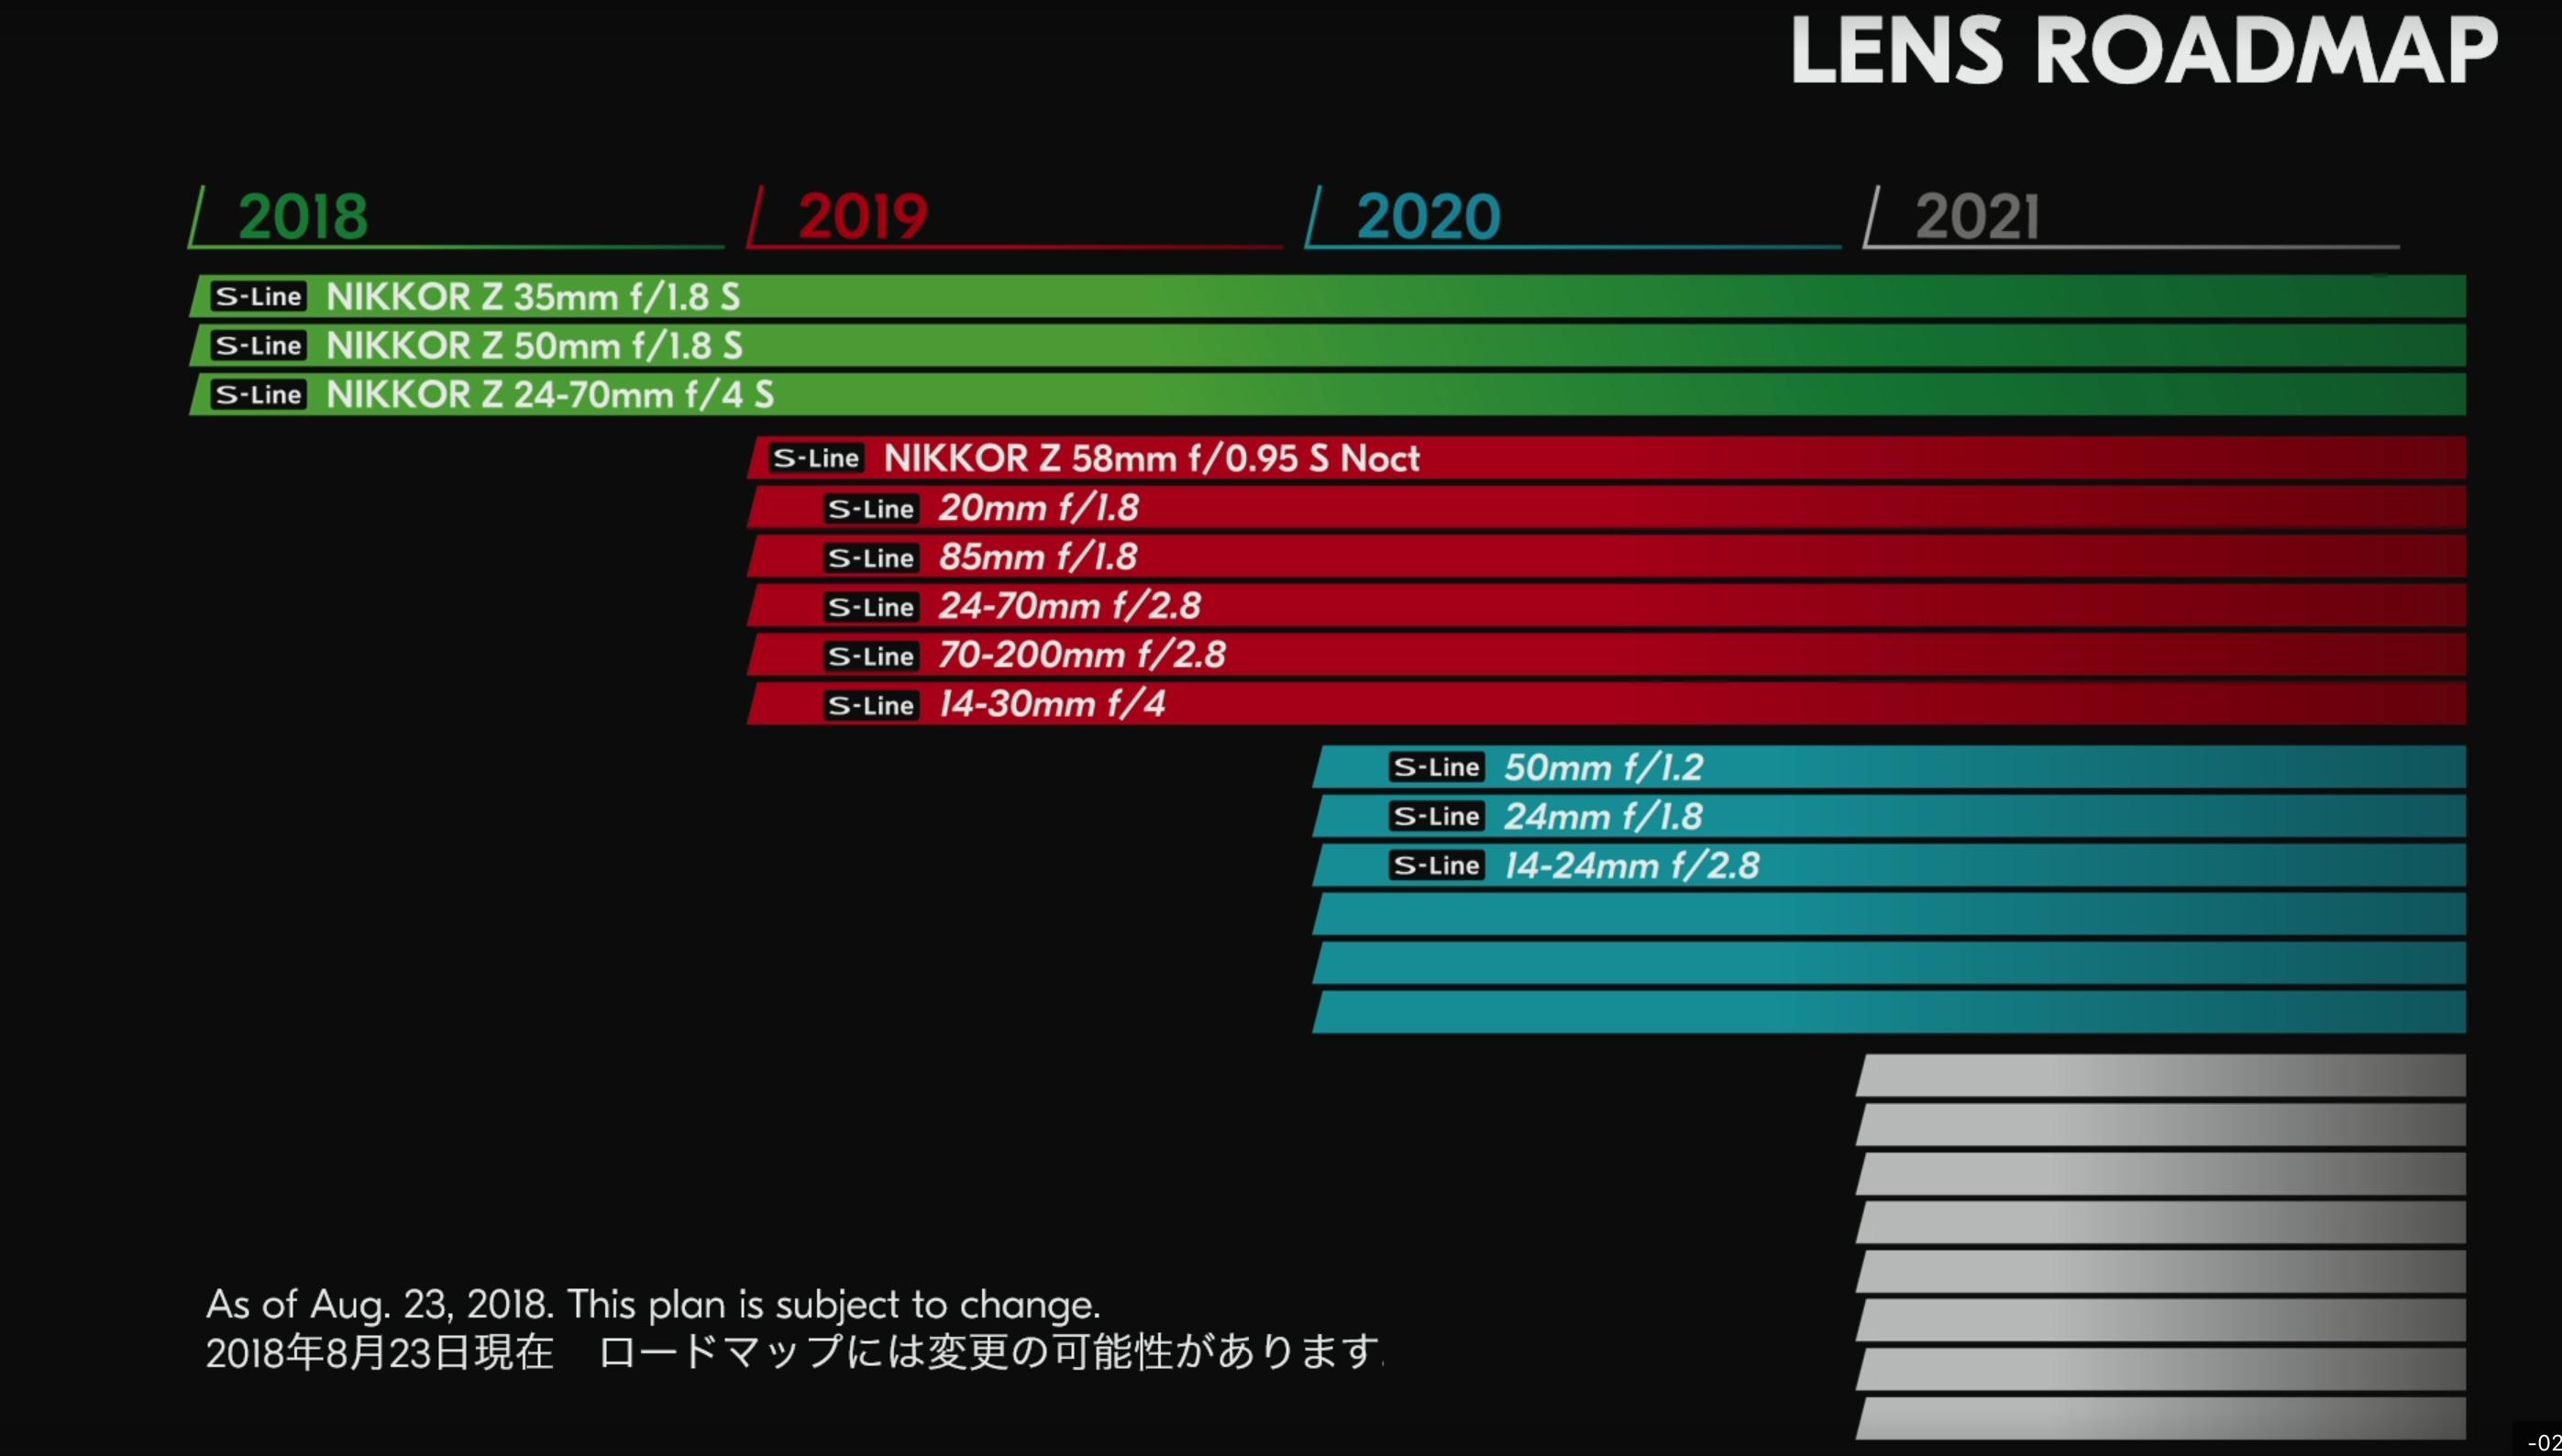 Nikkor S-line Z Lens